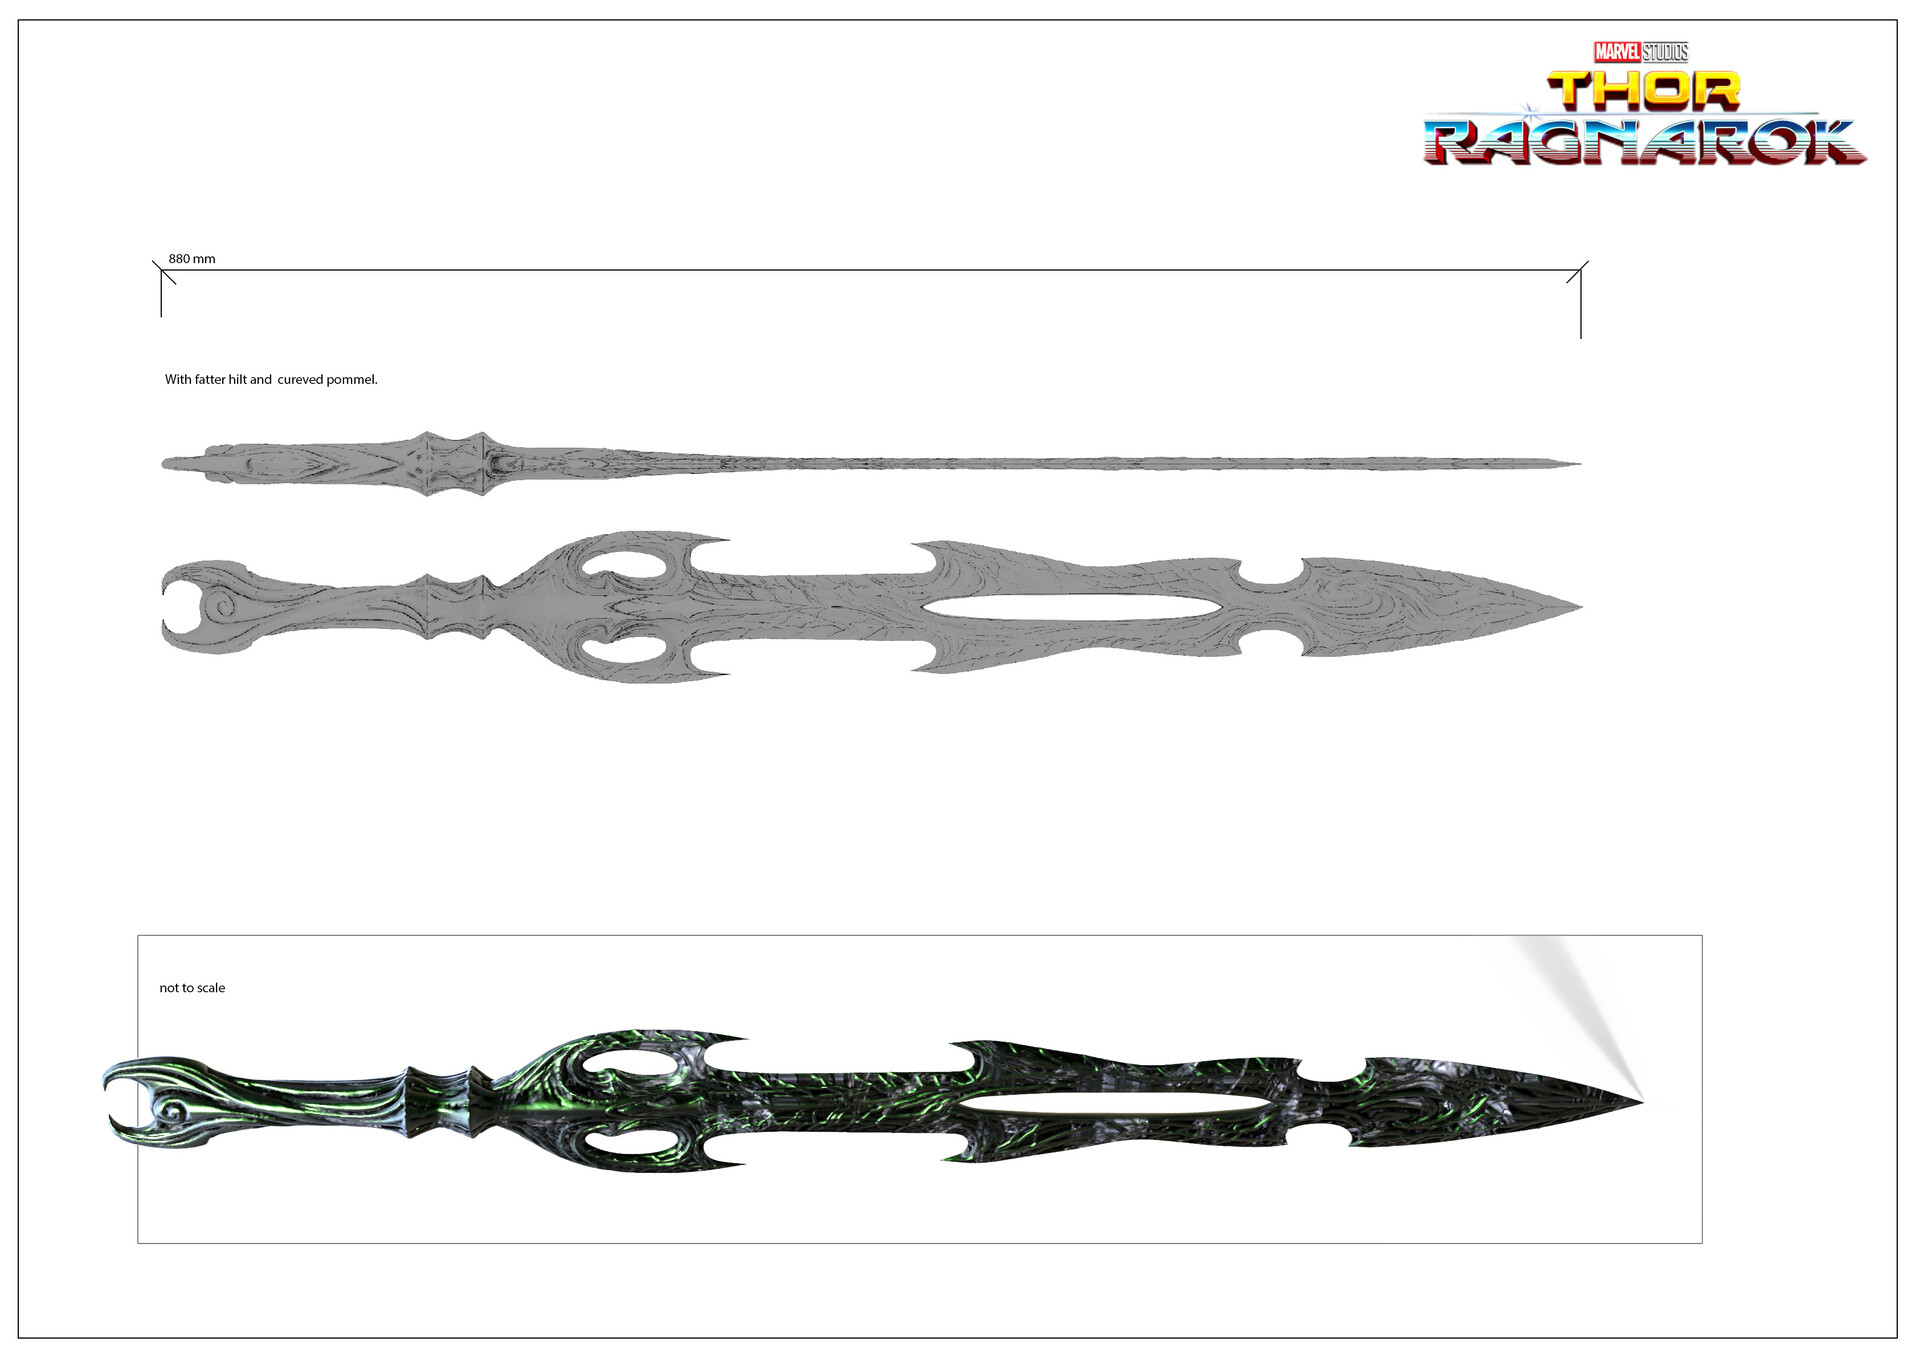 Hellas'  blade design and dimensions.